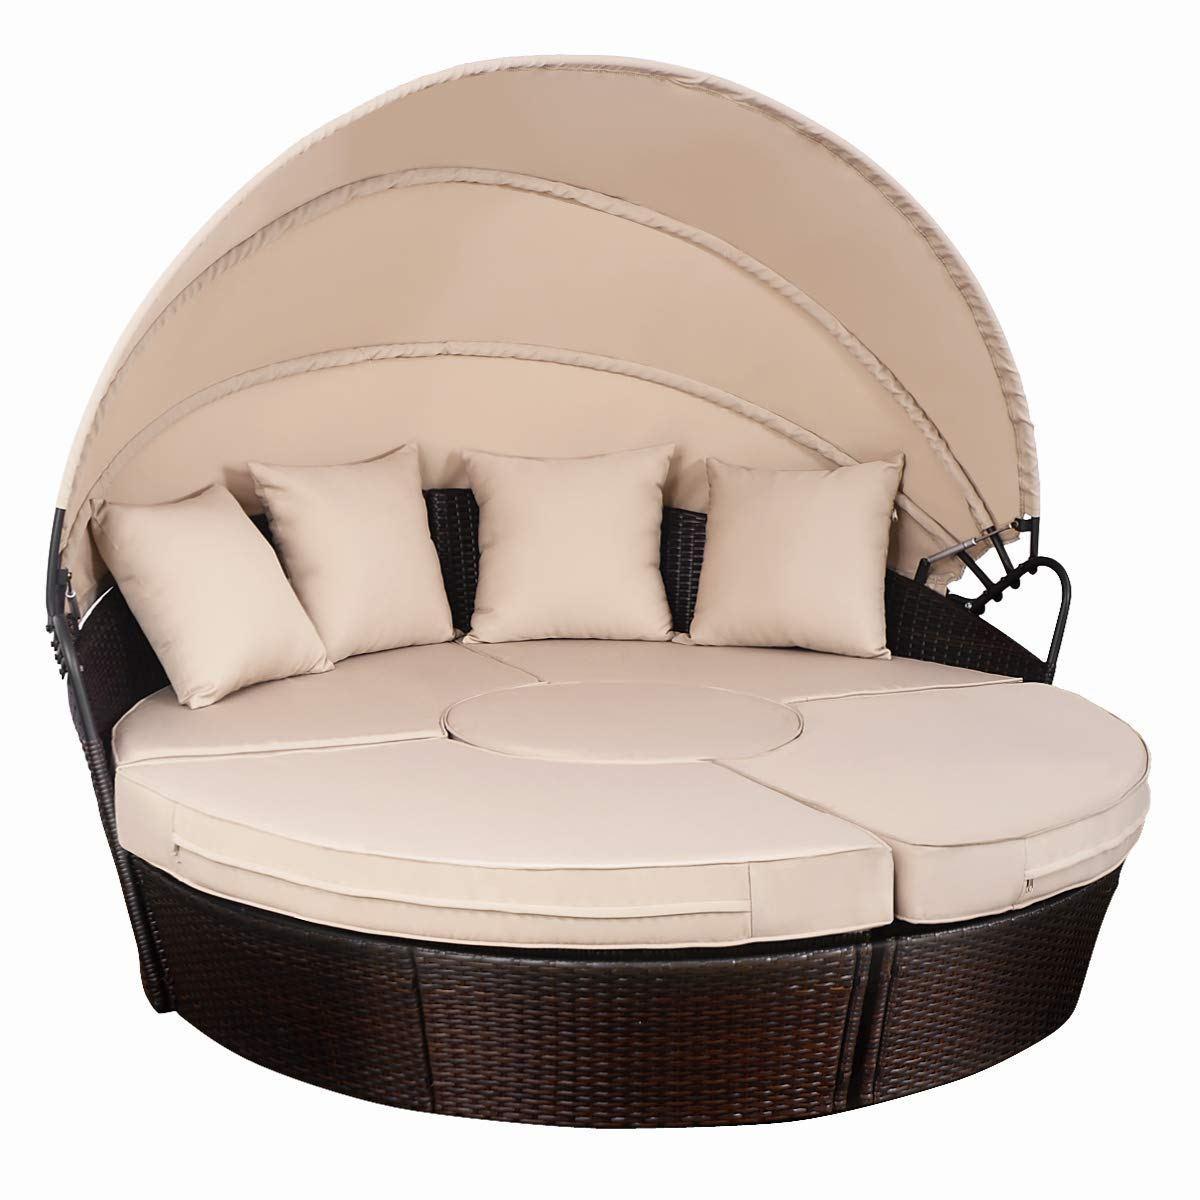 Patio Furniture Outdoor Lawn Backyard